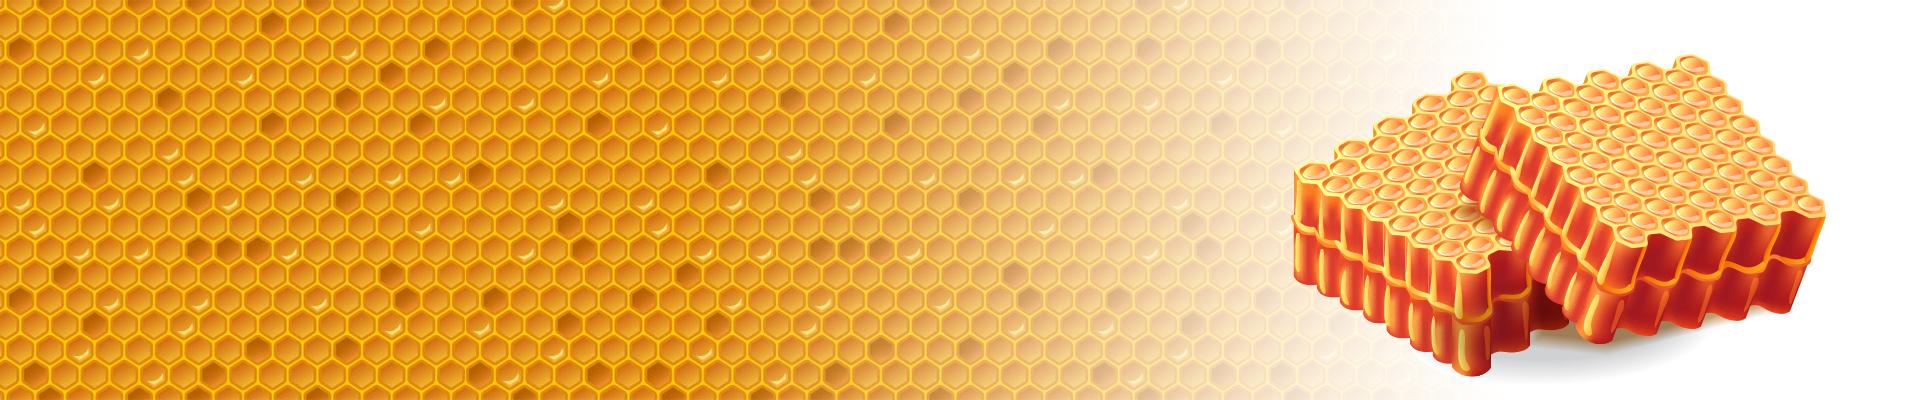 Hexagonal Shape Of Honeycomb Cells